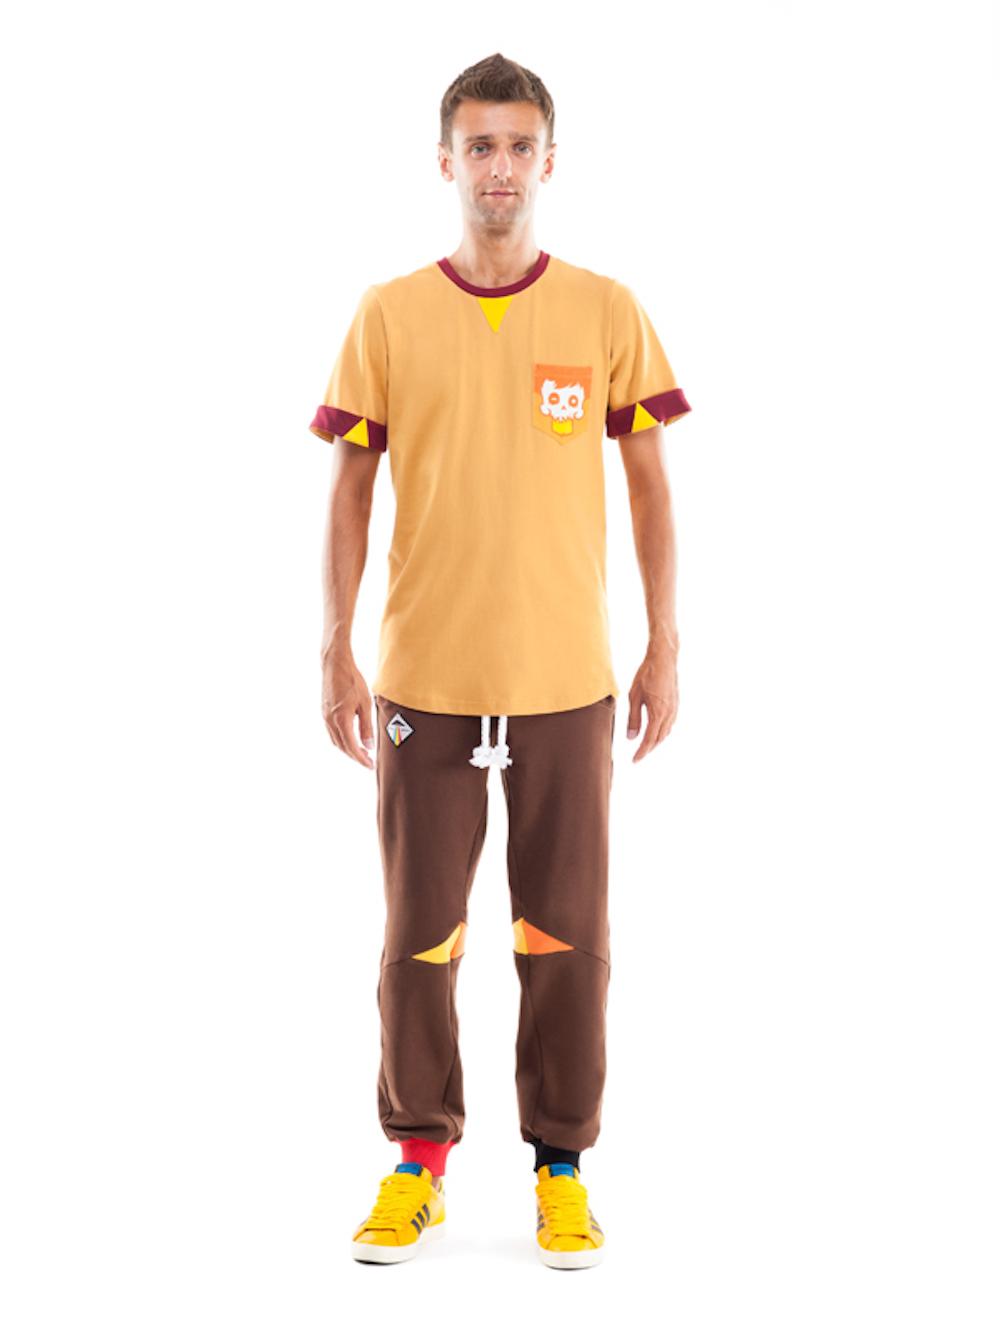 Serpens Sweatpants (Brown) - Okuaku